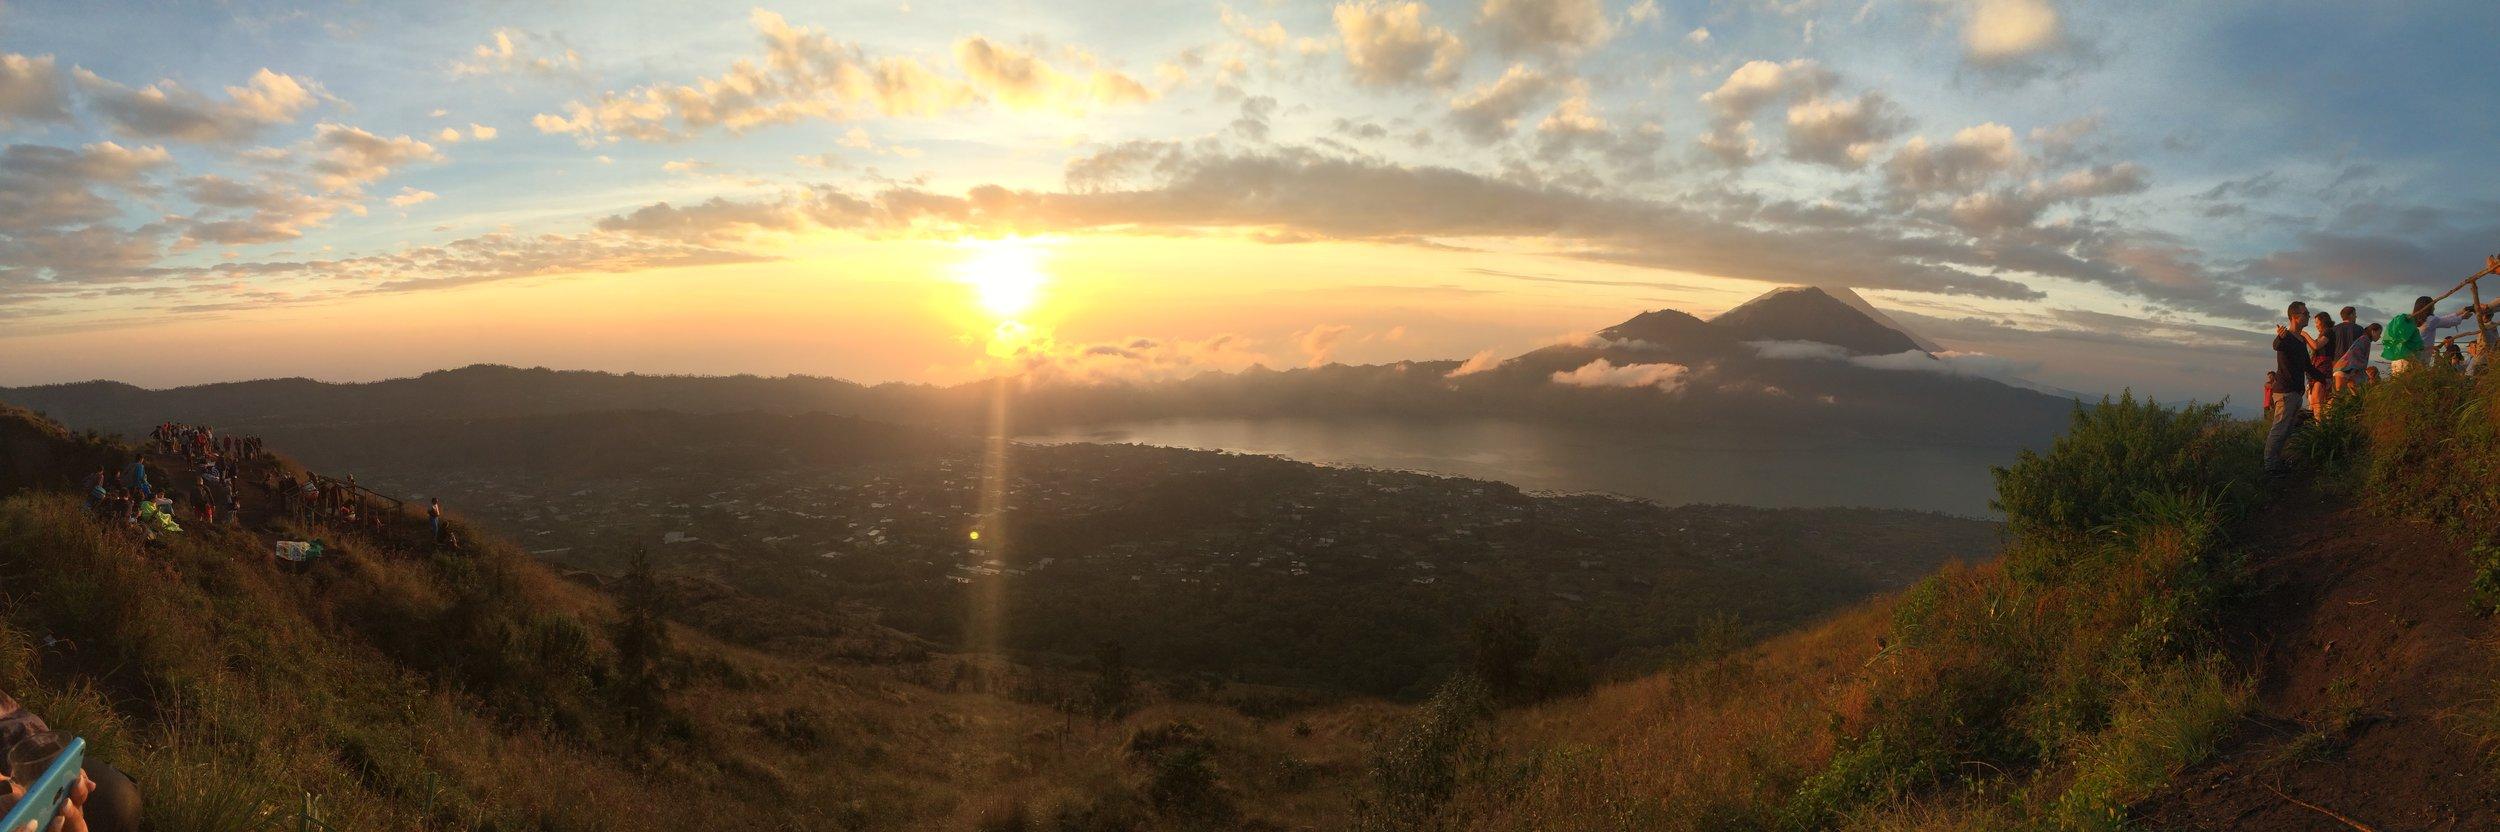 Sunrise from Mt. Batur volcano in Bali, Indonesia